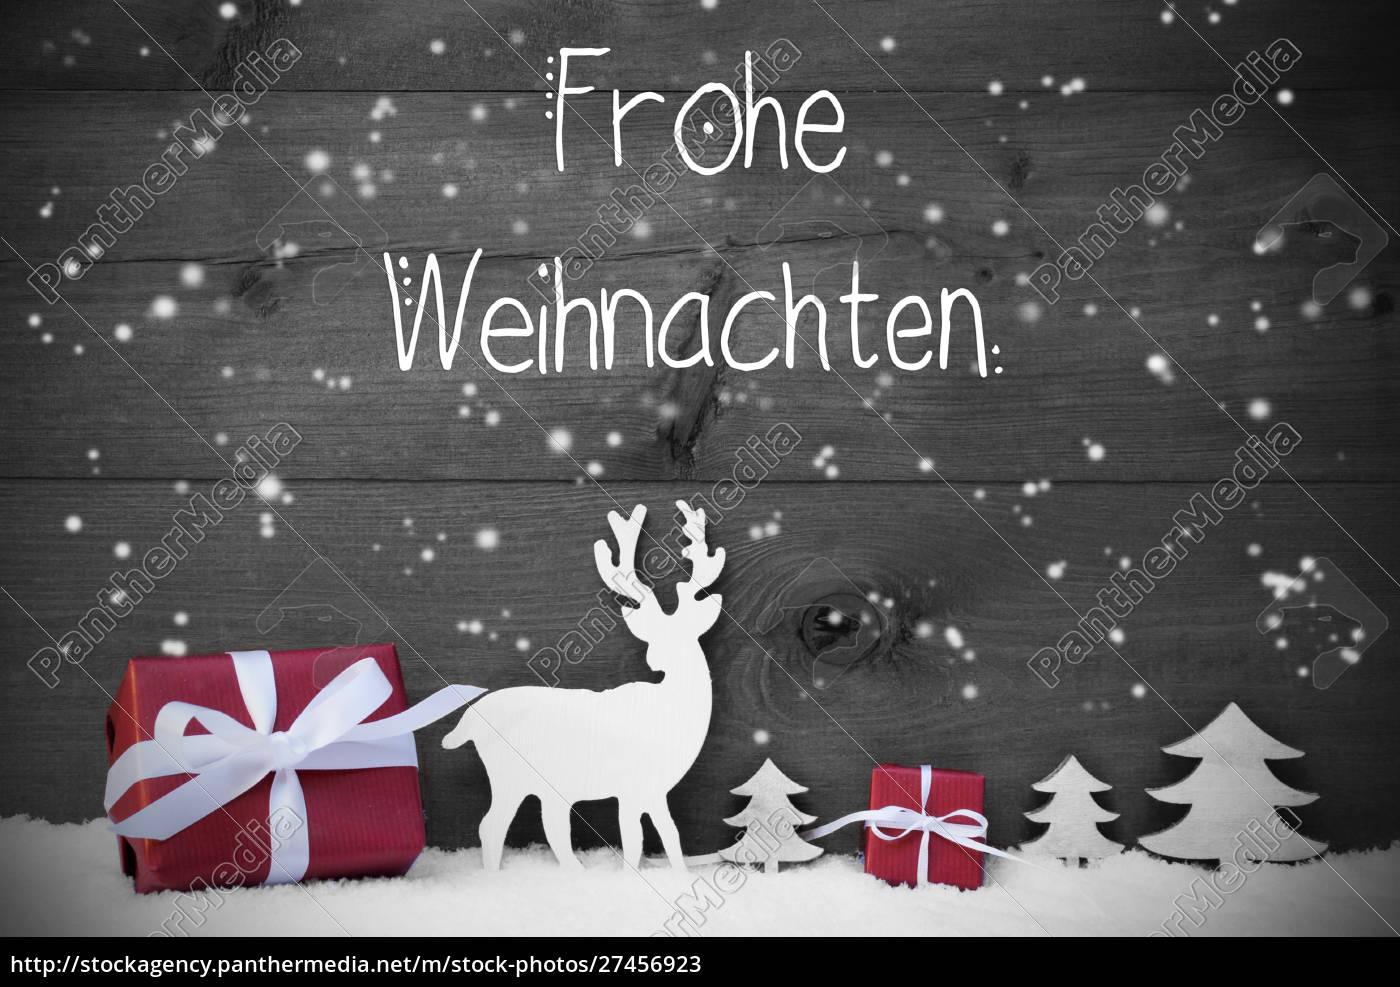 reindeer, , gift, , tree, , snowflakes, , frohe, weihnachten - 27456923